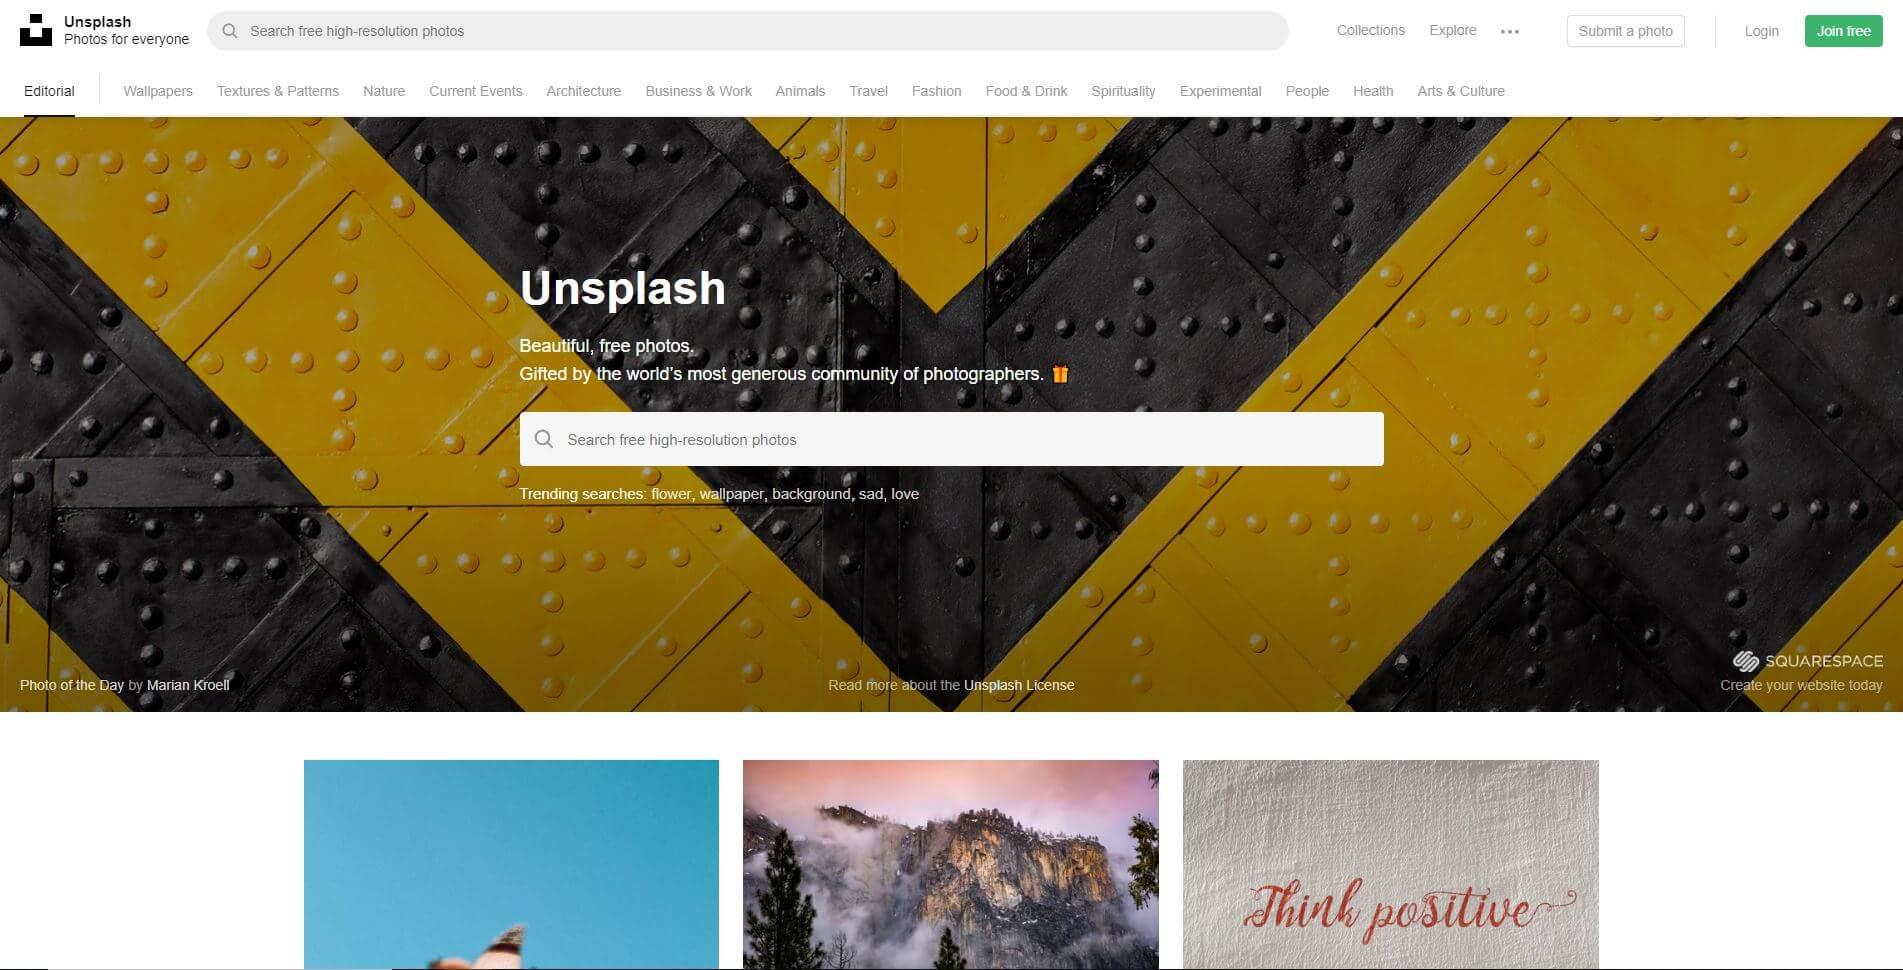 Unsplashのトップページ